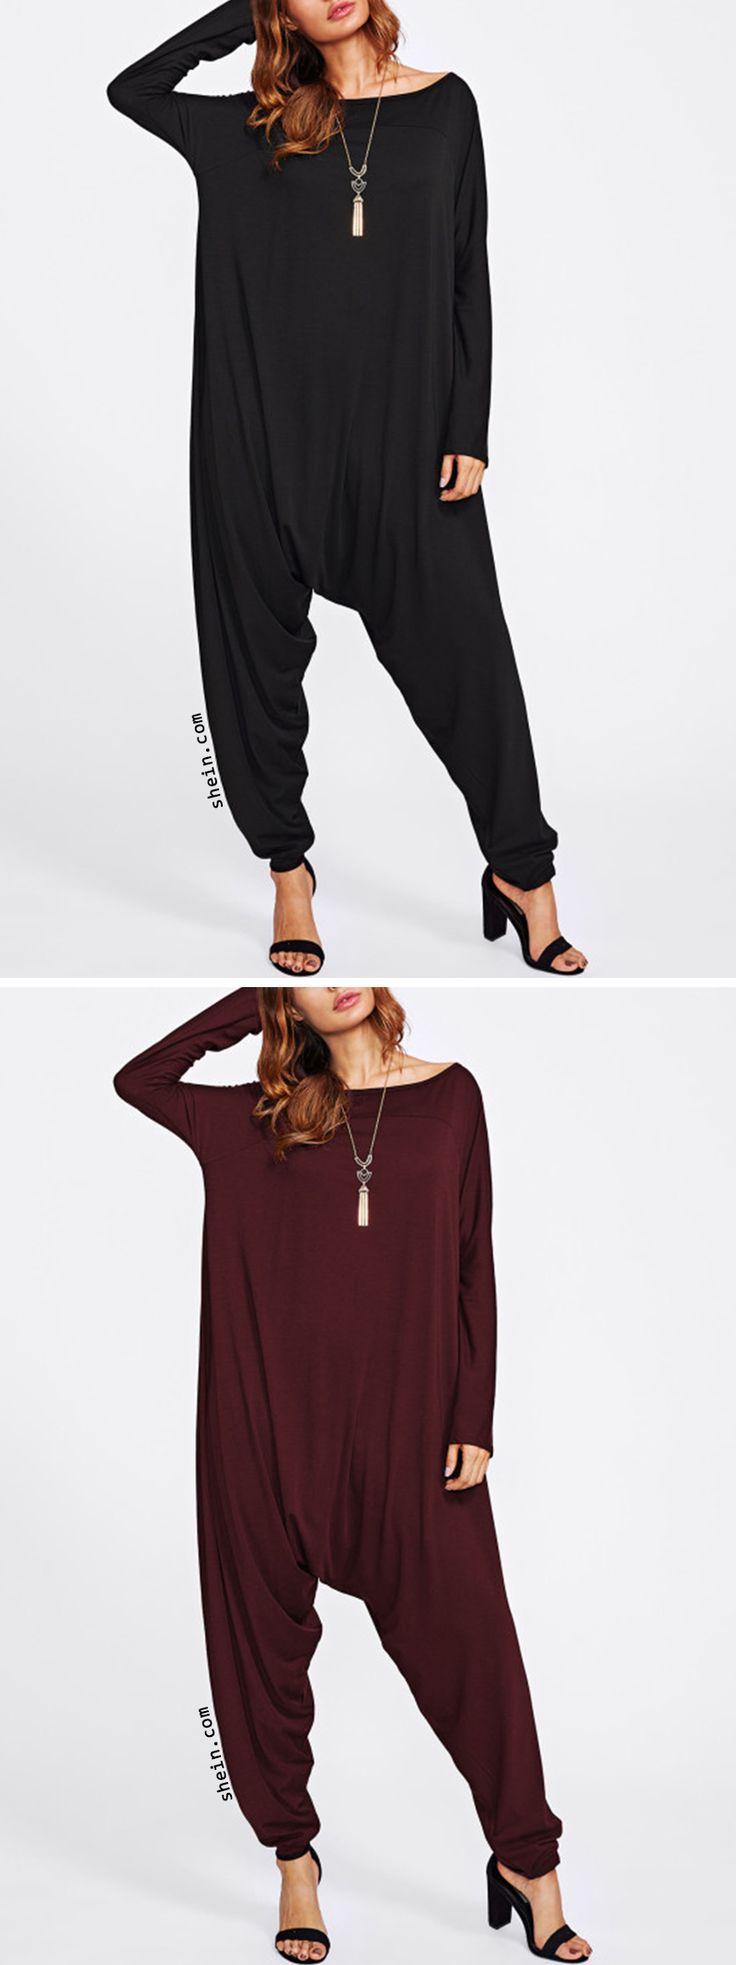 Drop Crotch Jersey Jumpsuit